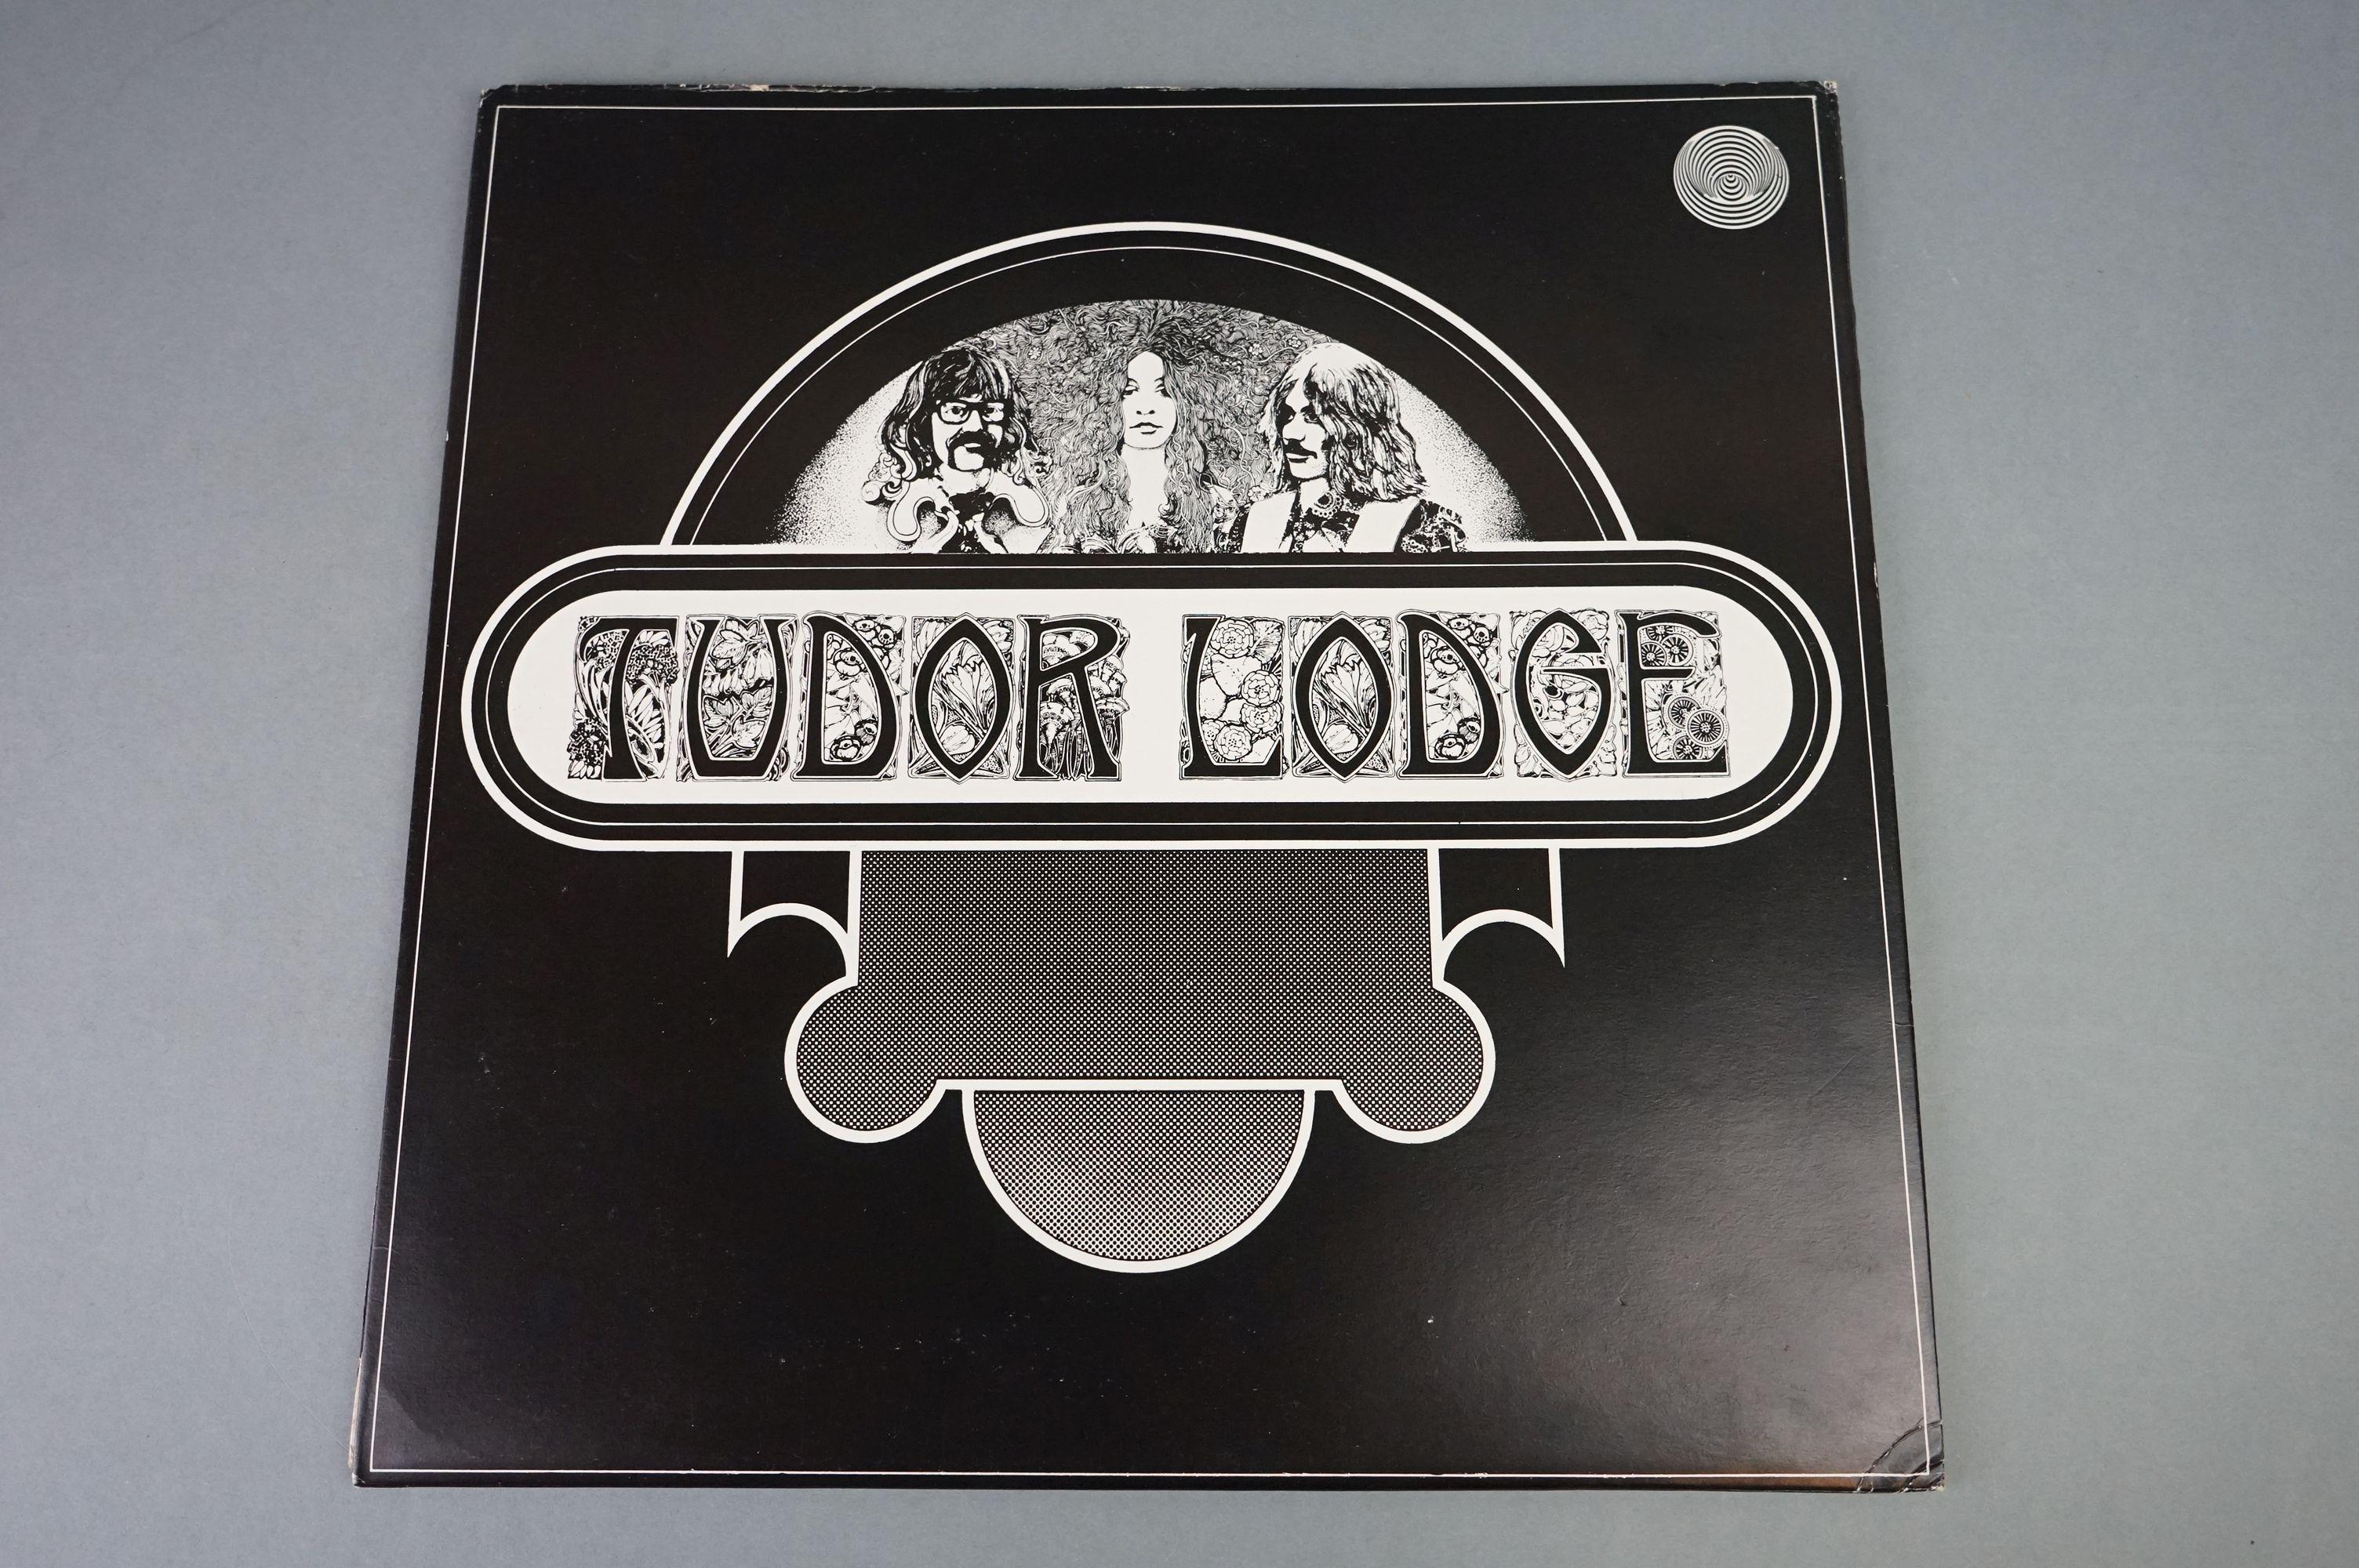 Vinyl - Tudor Lodge self titled LP on Vertigo 6360043 Unofficial release, not play tested